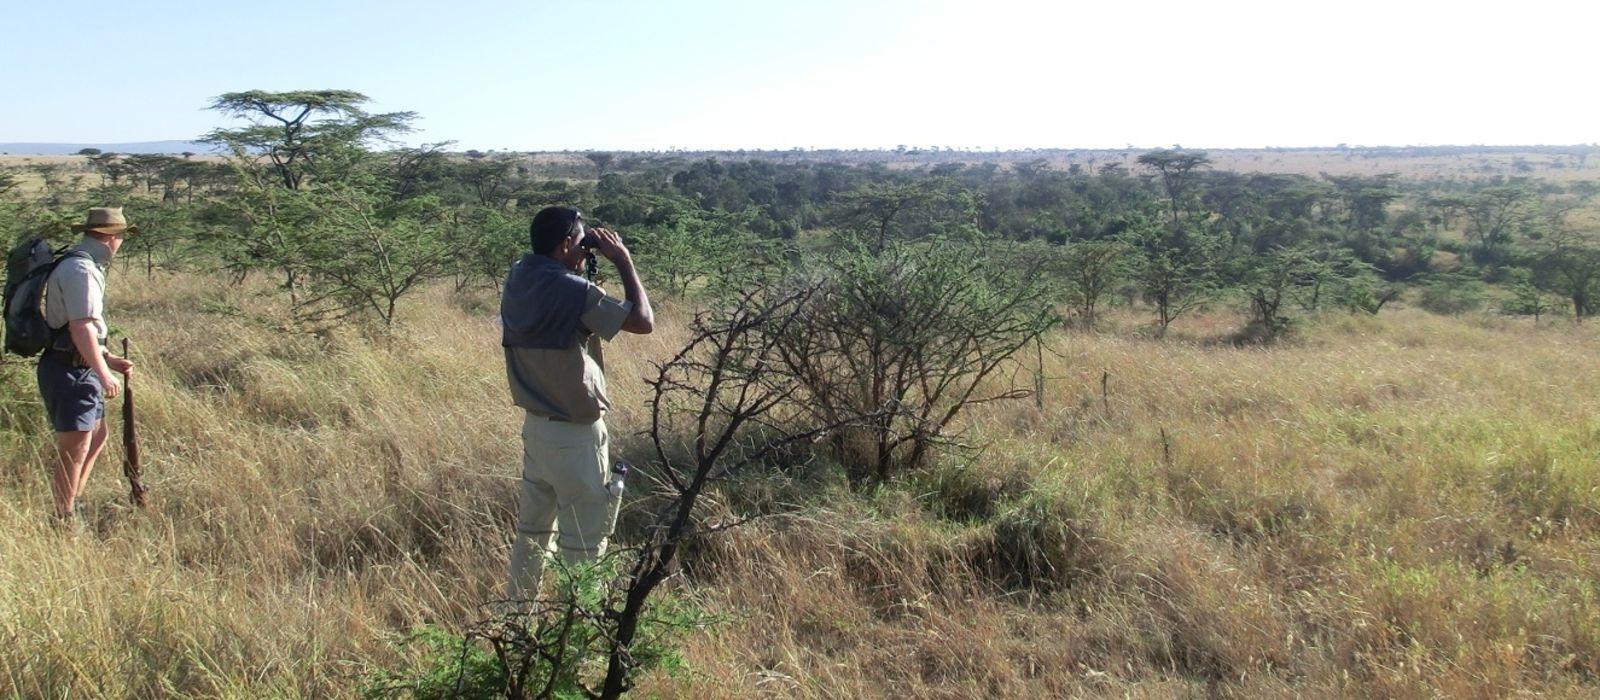 Destination Masai Mara Walking Safari Kenya